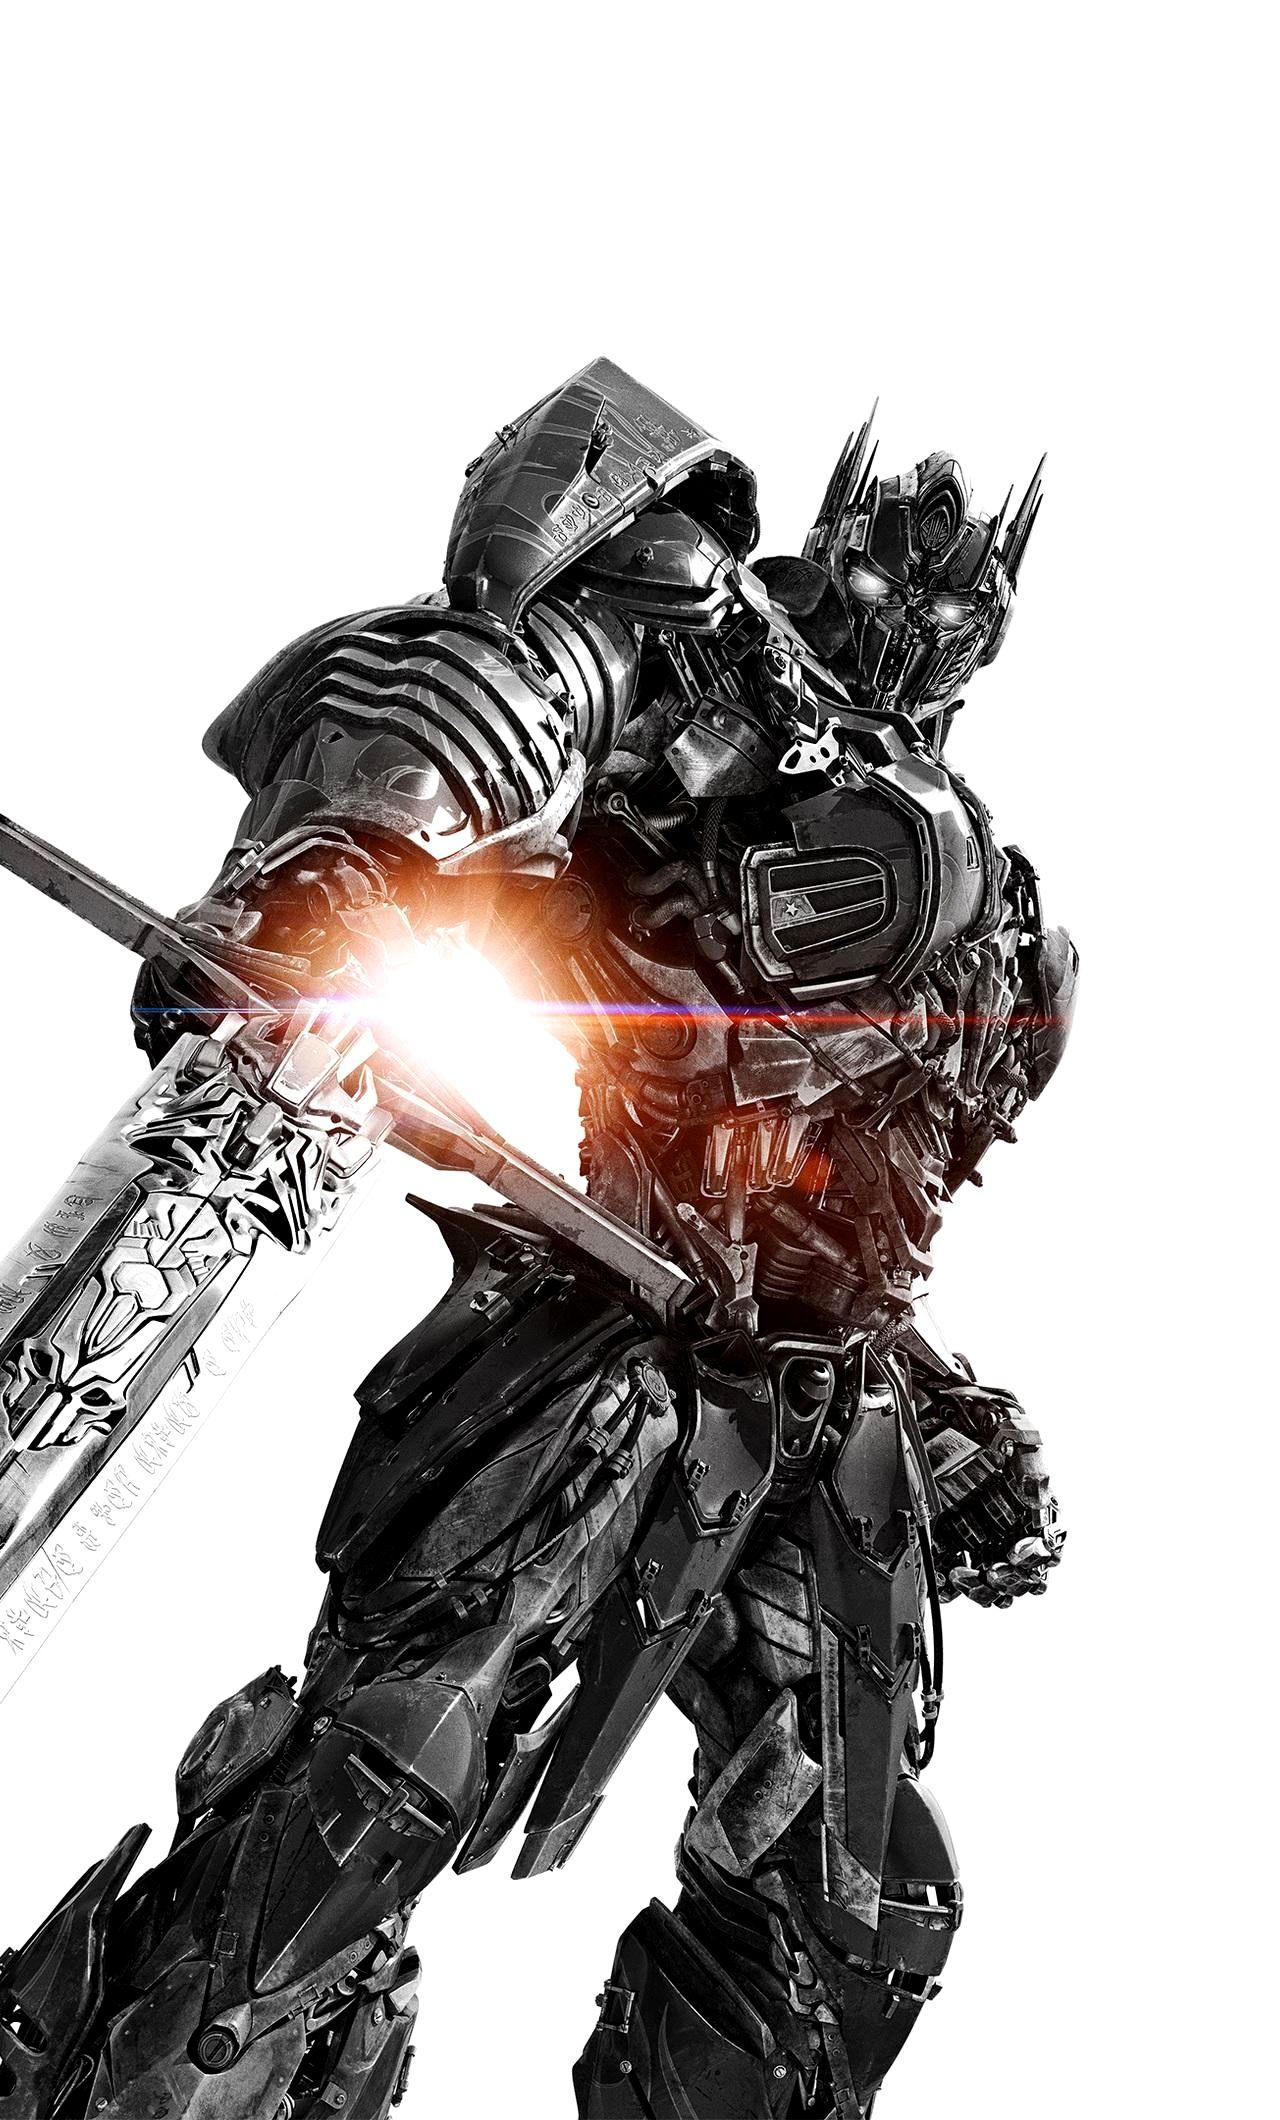 Transformers Wallpaper 4k Iphone Trick In 2020 Optimus Prime Wallpaper Transformers Star Wars Fan Art